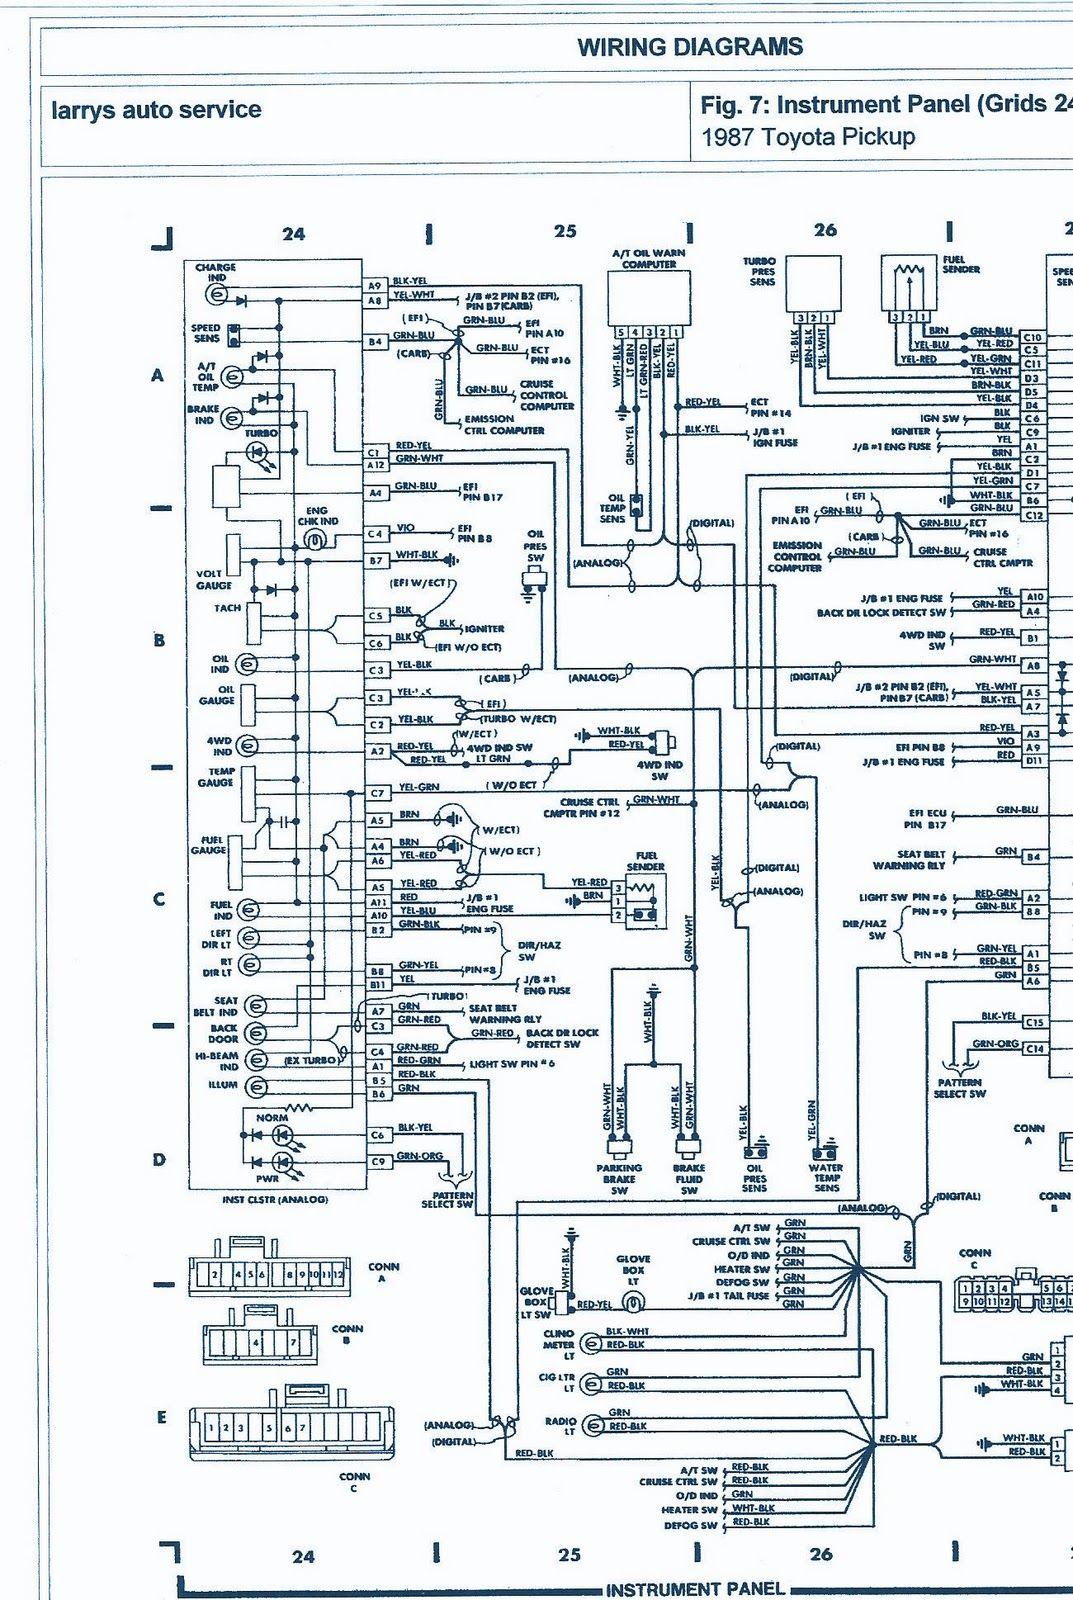 2006 Toyota Tacoma Trailer Wiring Diagram